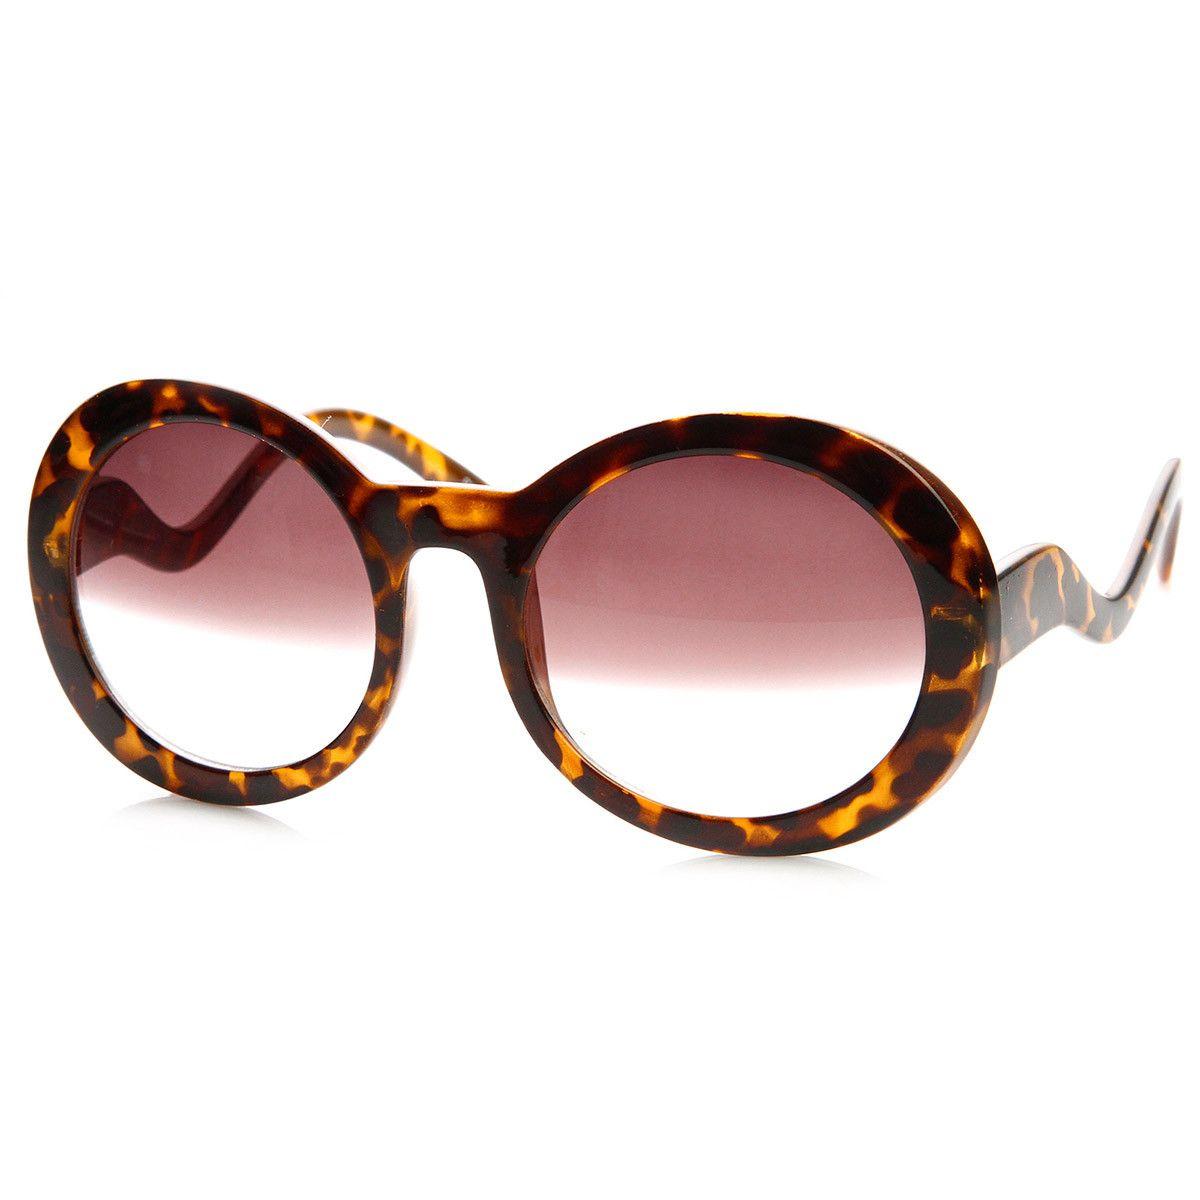 Womens High Fashion Round Half Tint Celebrity Oversized Sunglasses